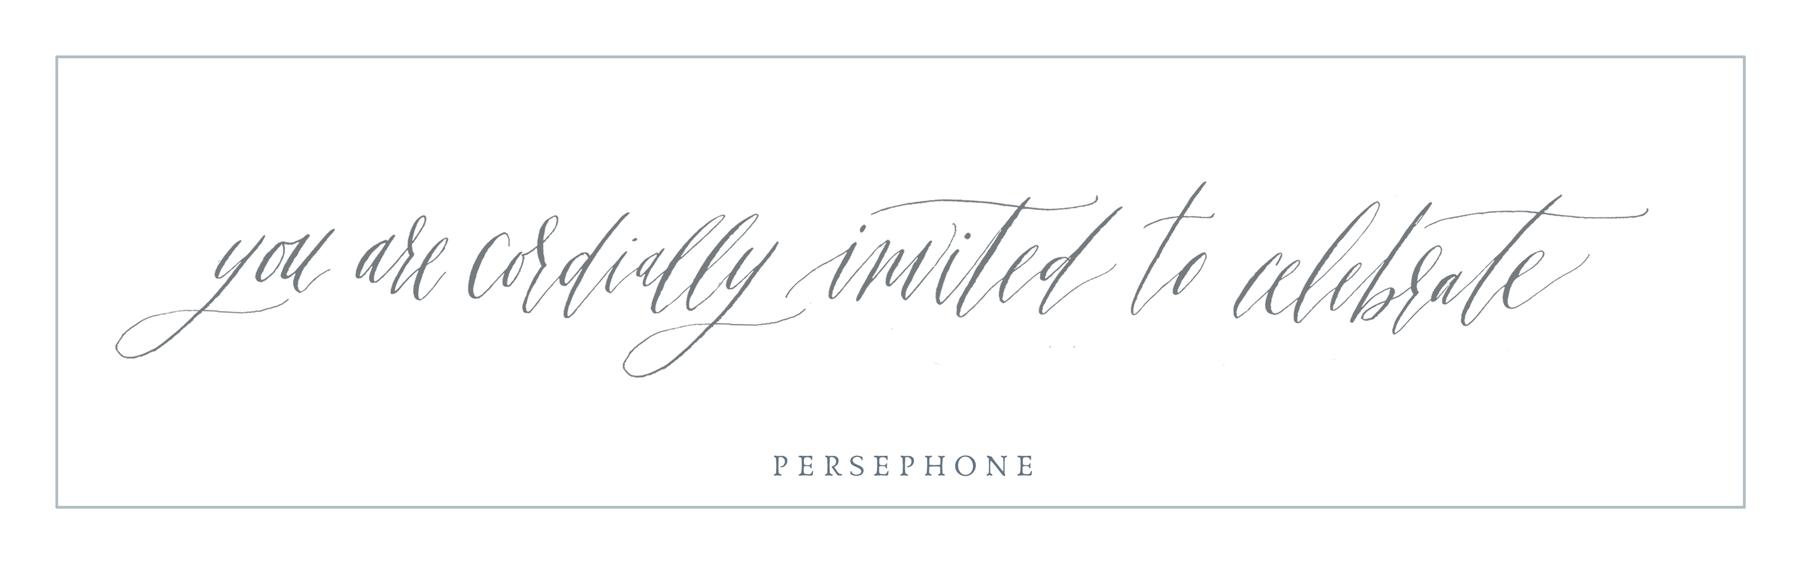 callig styles persephone.jpeg